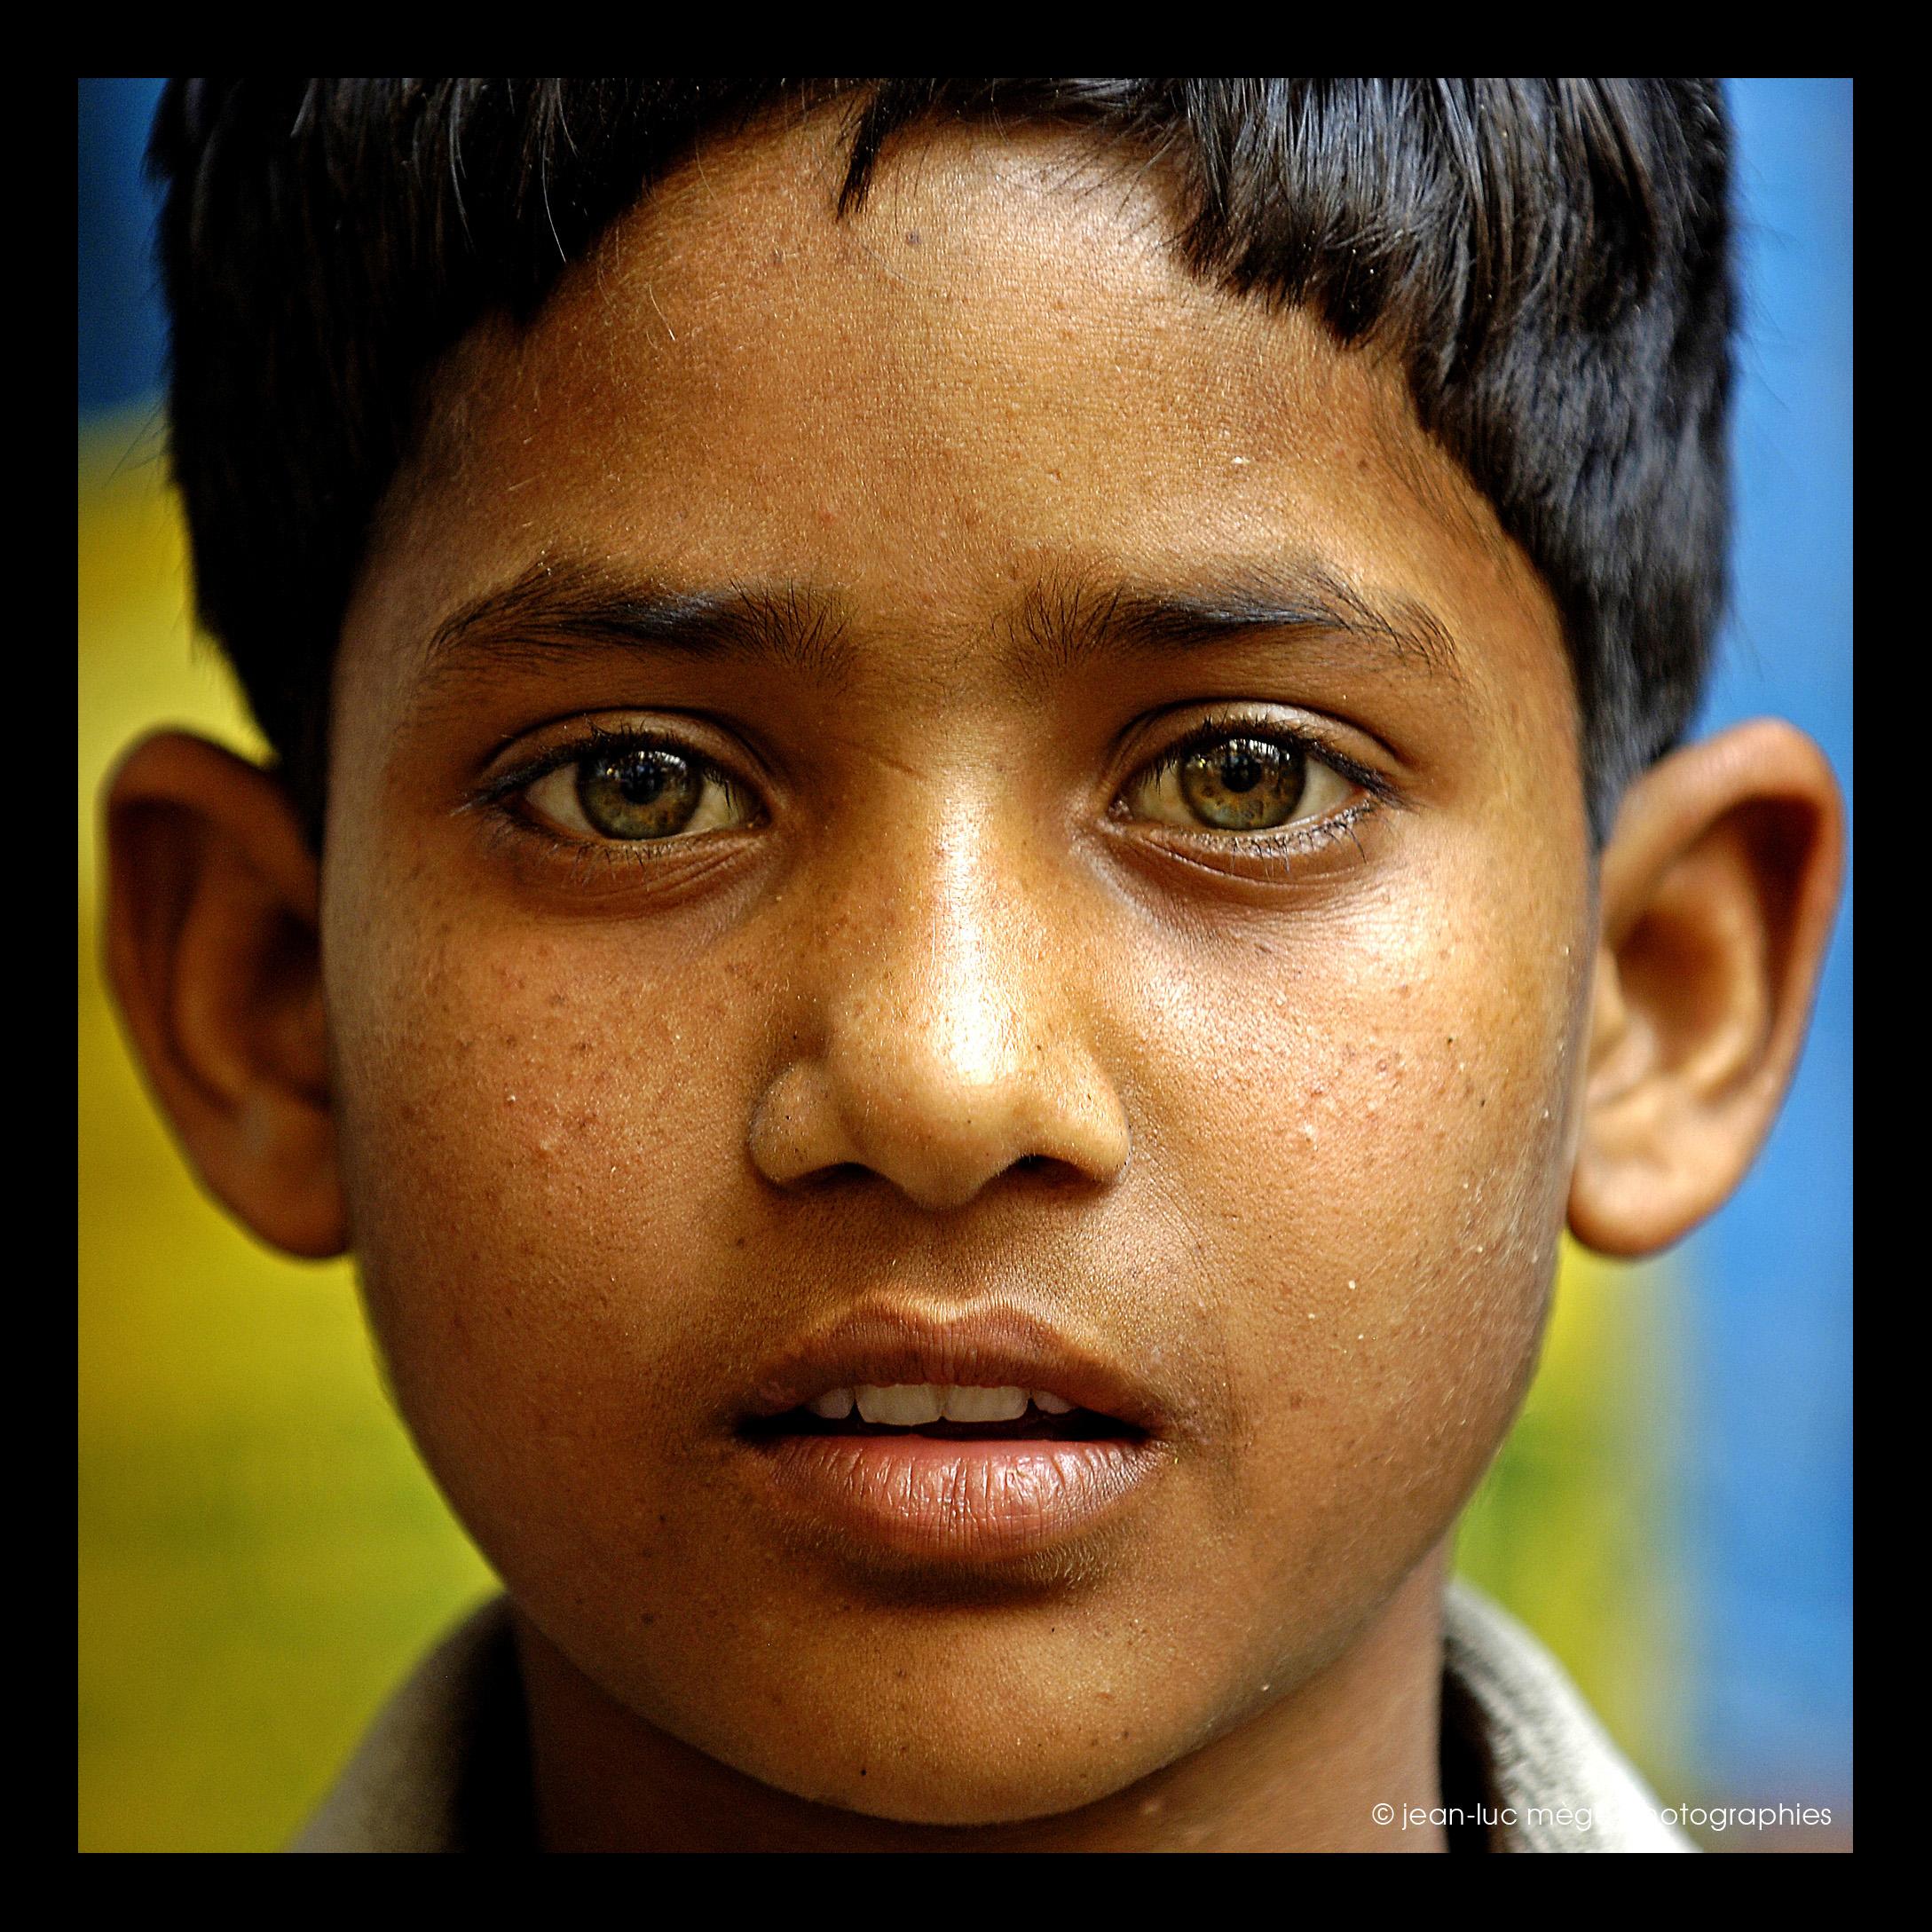 India_dsc6688.jpg